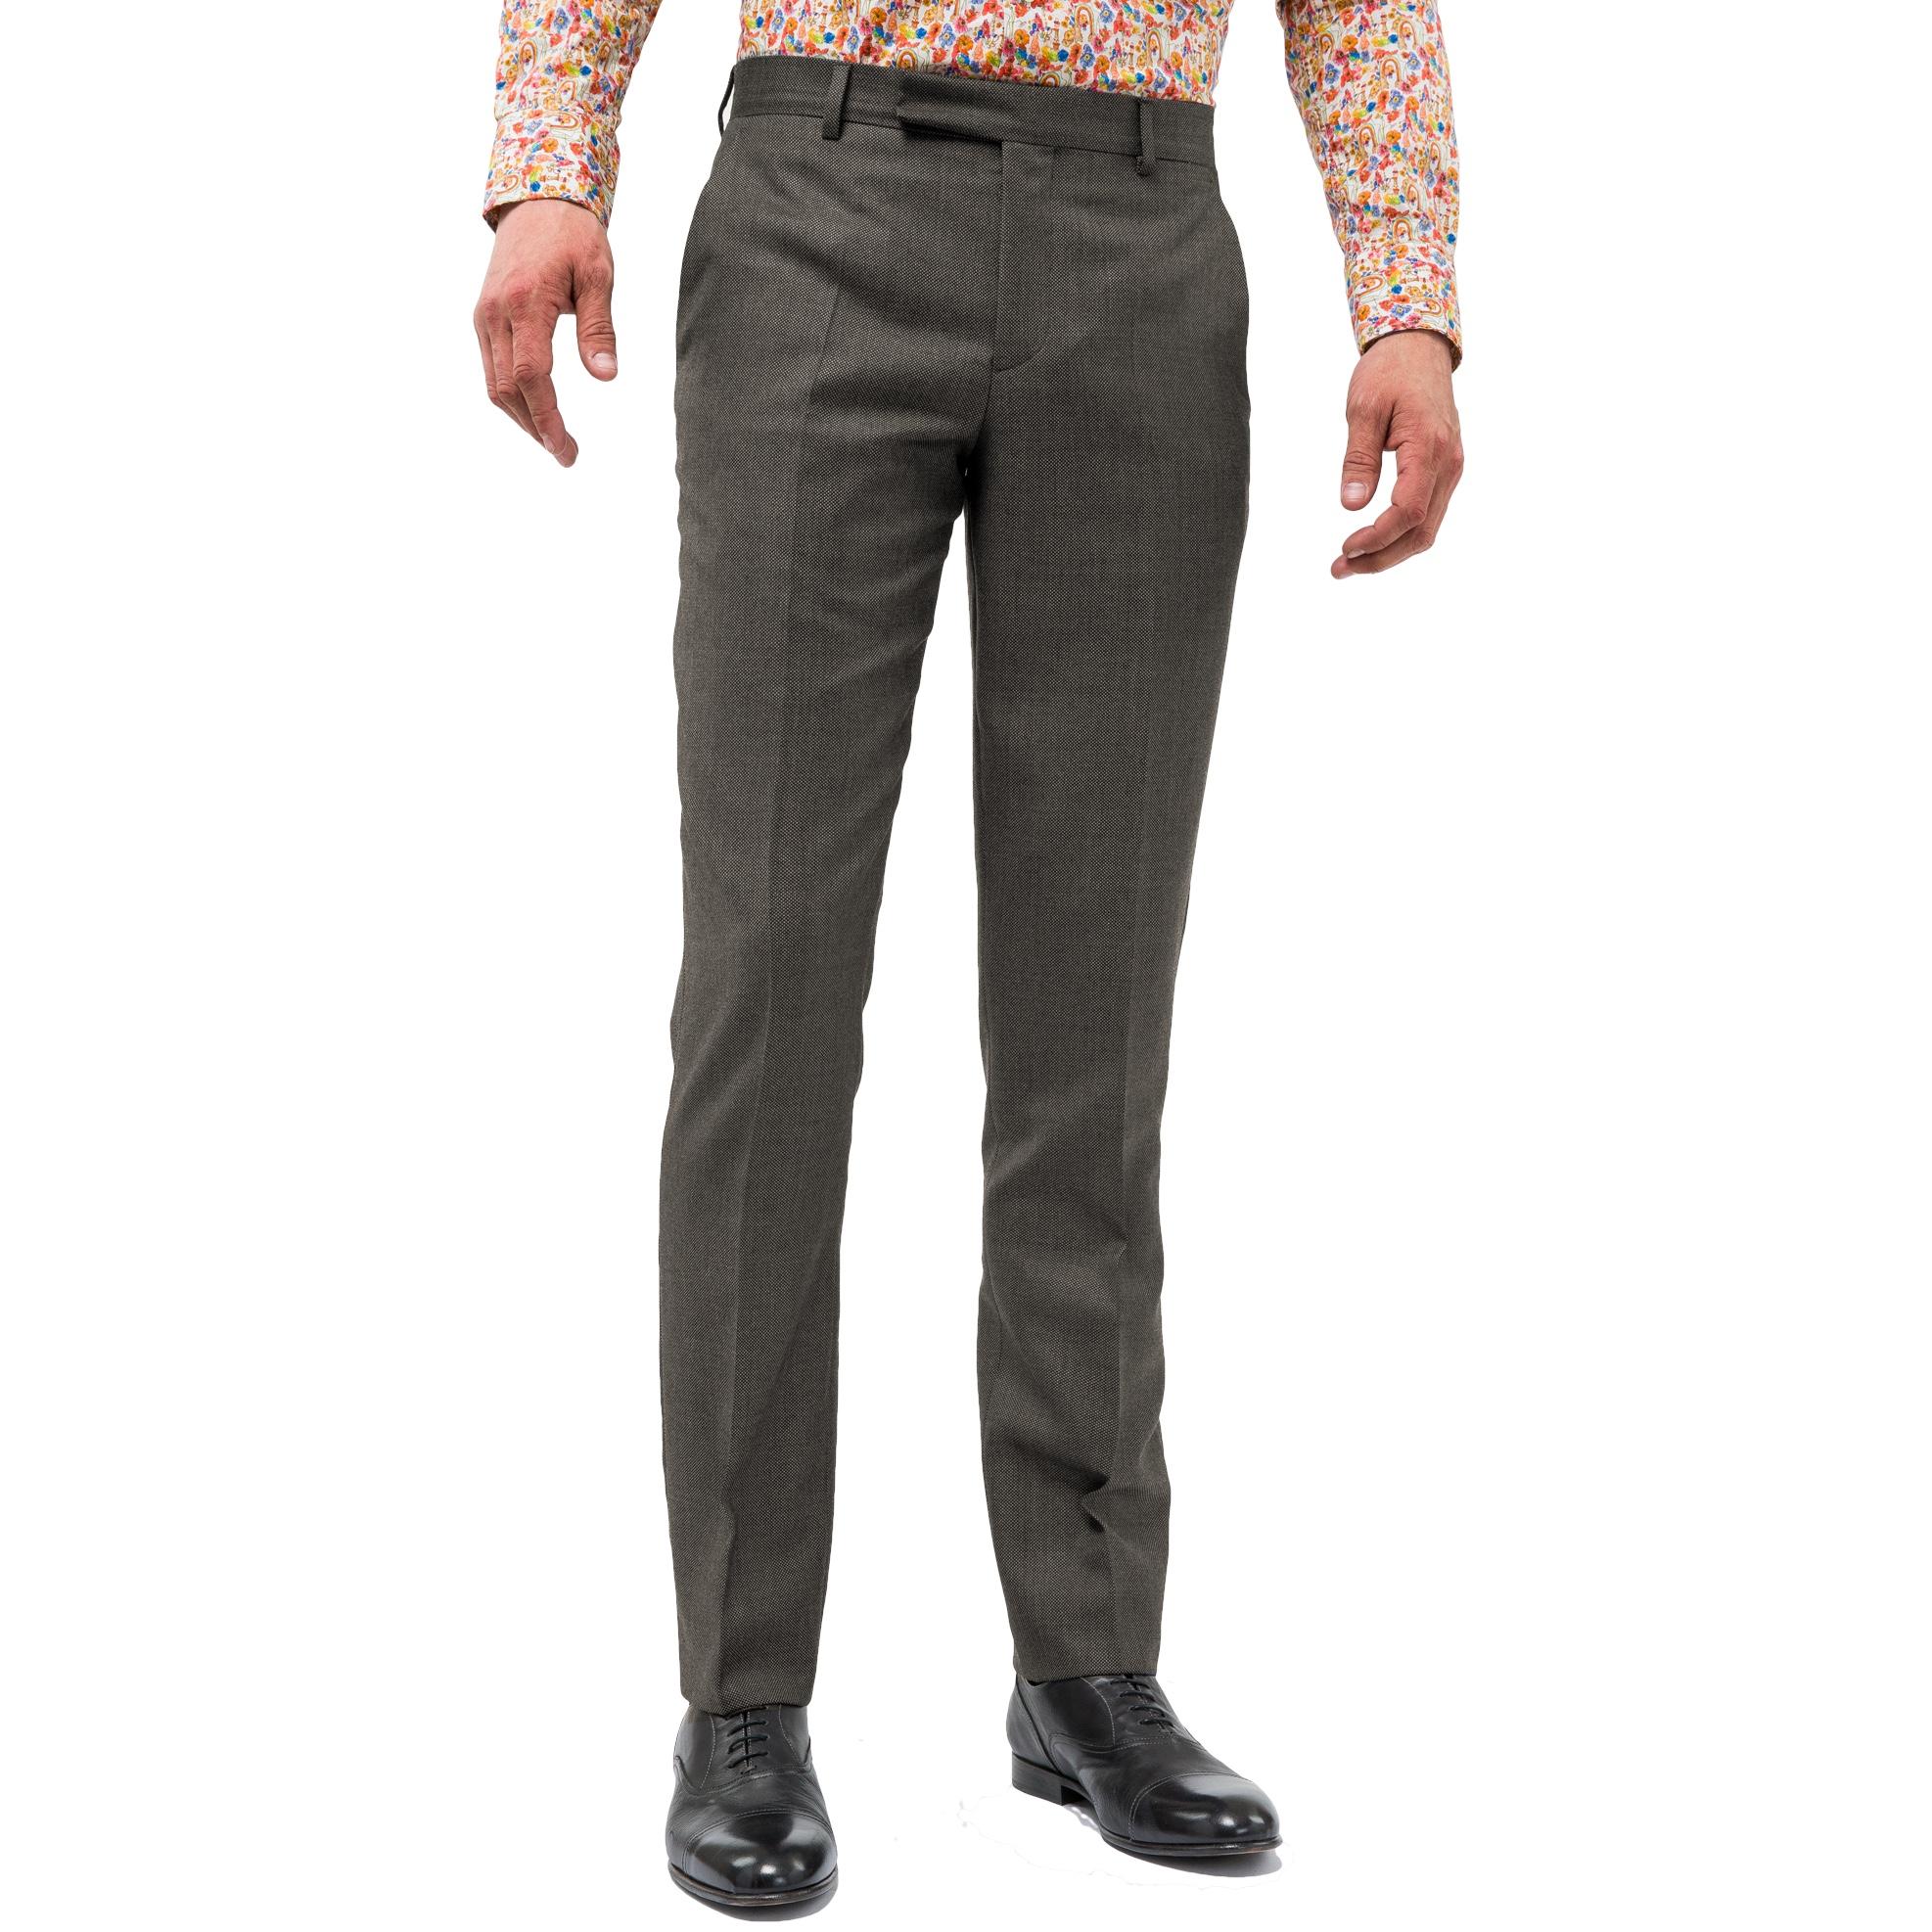 paul smith the soho - mens tailored-fit dark grey birdseye wool suit pspc-1439-w07-e_4.jpg